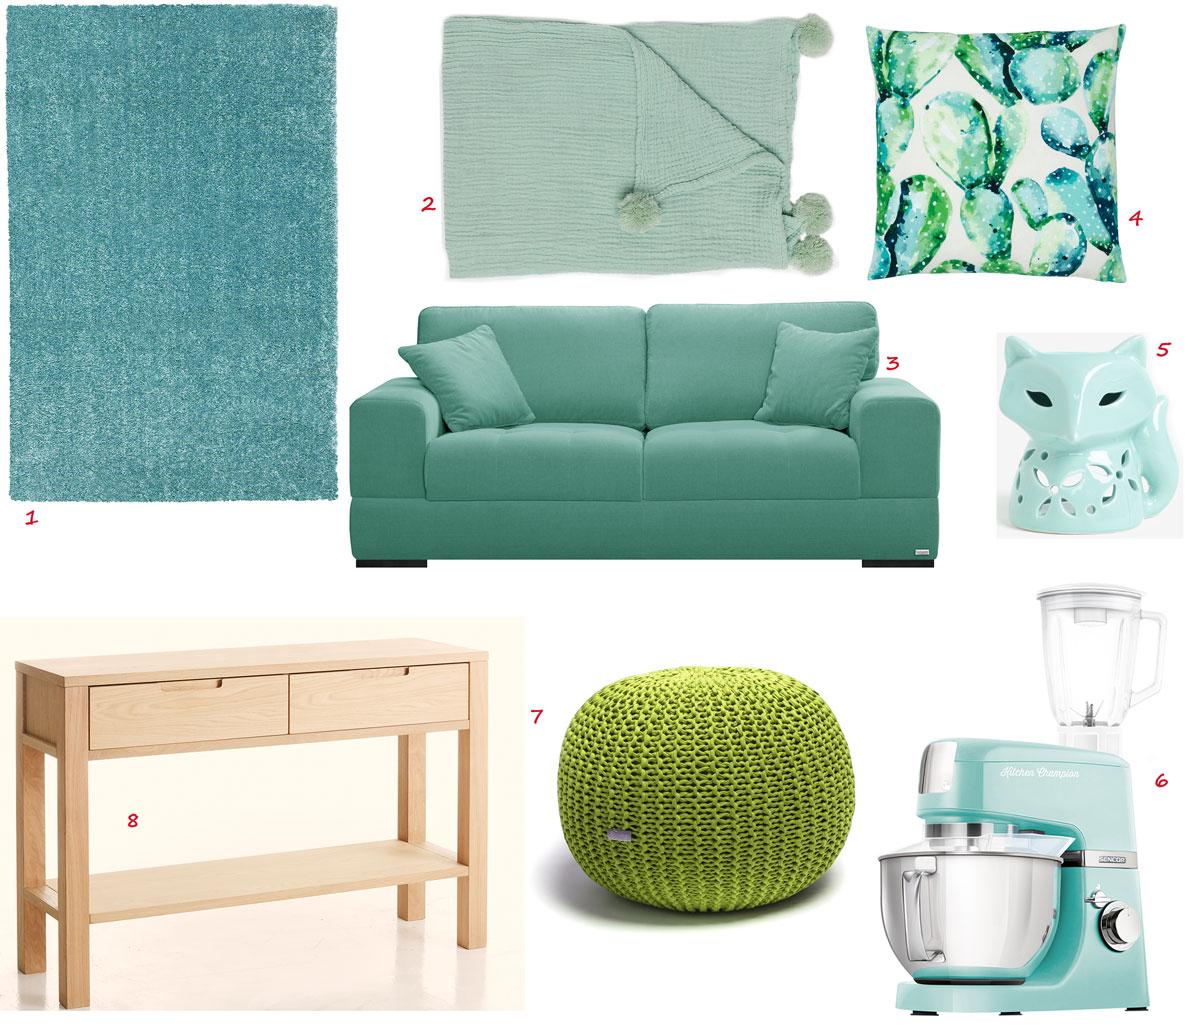 tyrkysový koberec s nízkym vlasom, bavlnená mentolová deka, mentolová pohovka, bavlnená obliečka na vankúš so vzorom kaktusov, mentolová aromalampa líška, zelený pletený puf, mentolový kuchynský robot s mixérom a nádobou na miešanie, stolík z dyhy